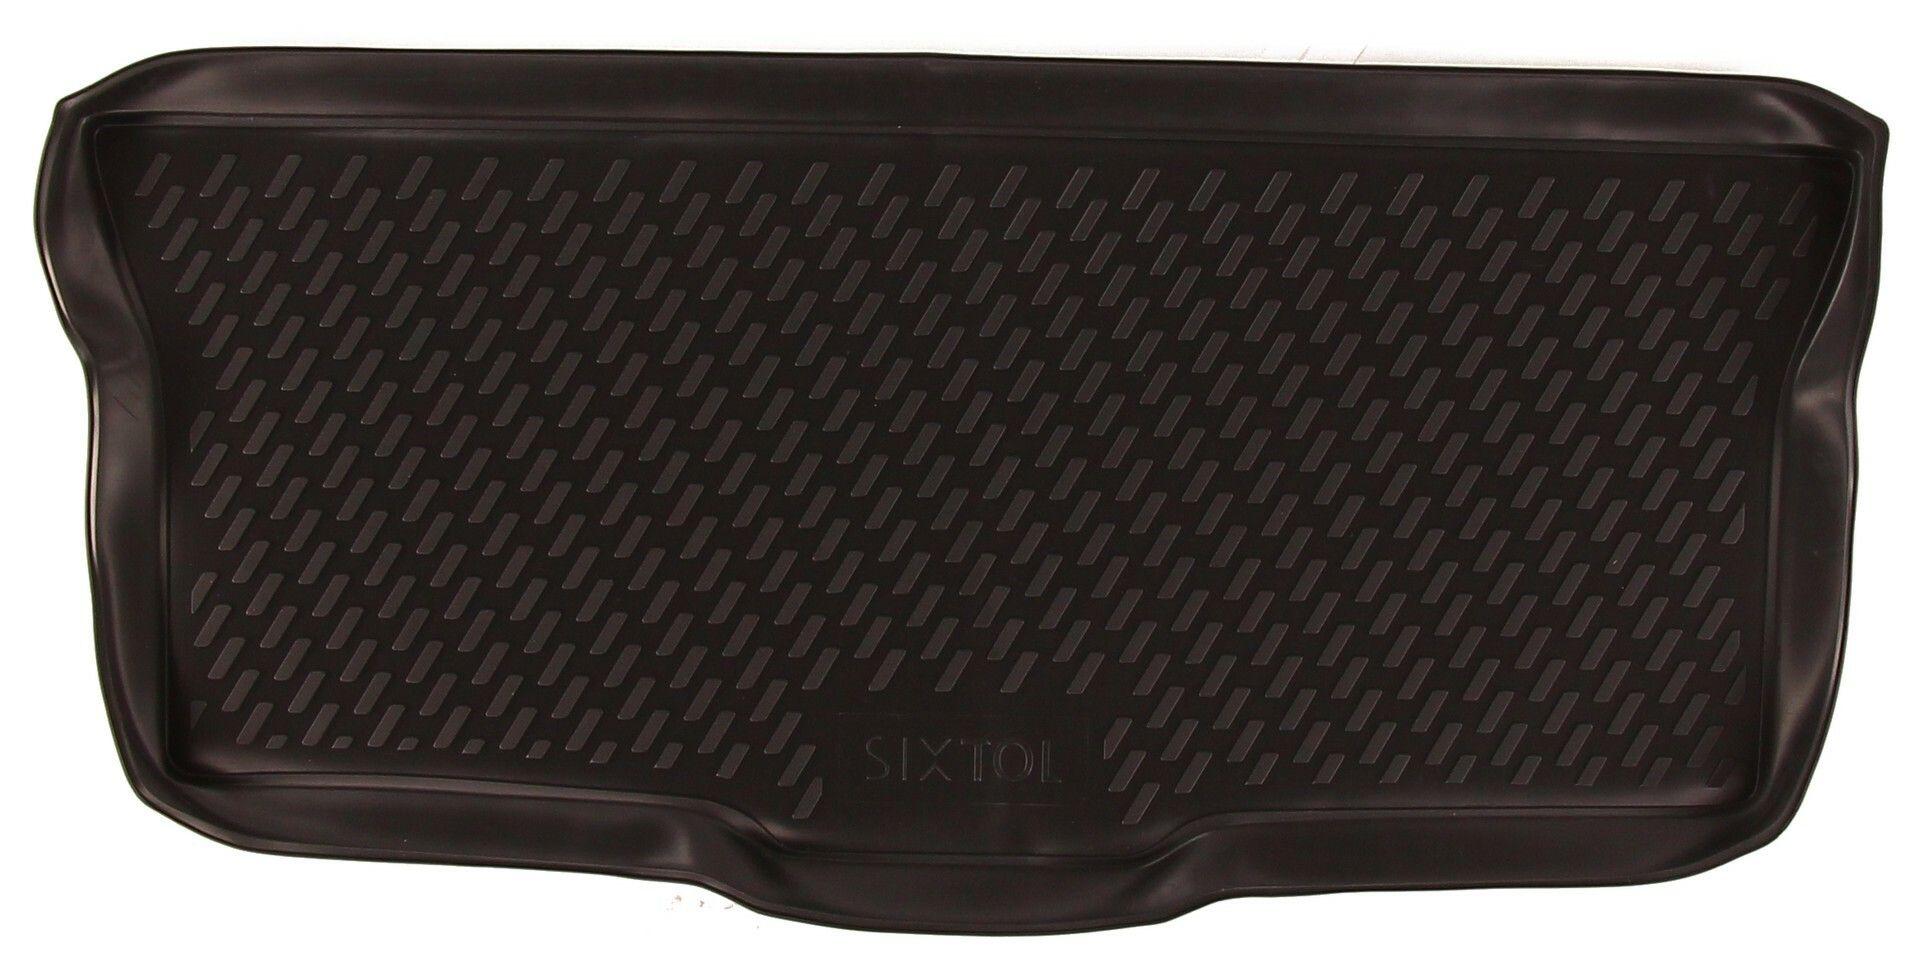 Vana do kufru gumová Citroen C1 2010-> hb. SIXTOL